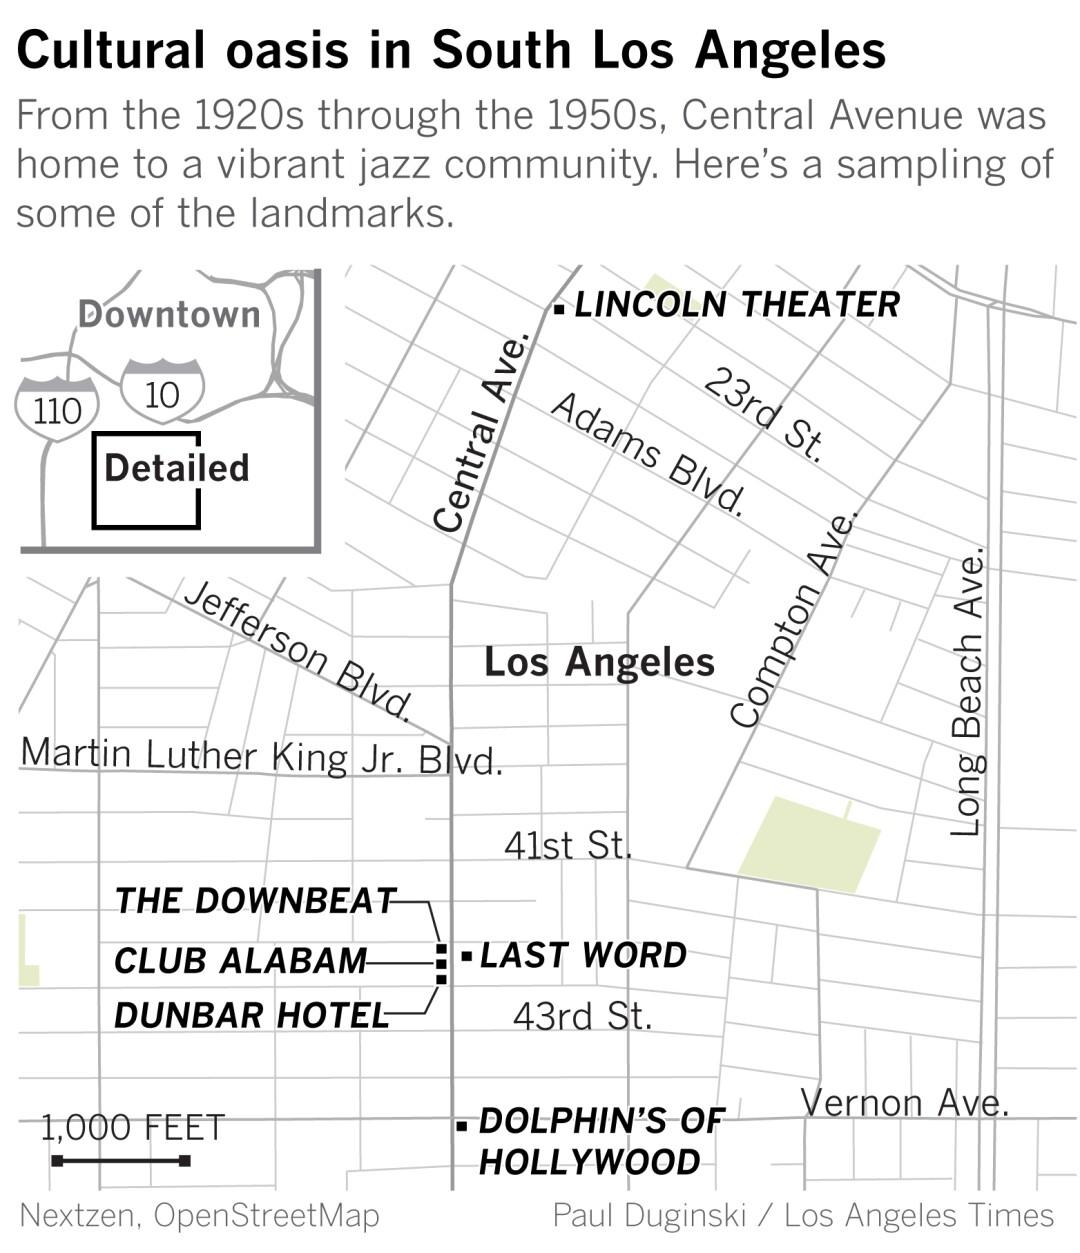 Central Avenue jazz landmarks.